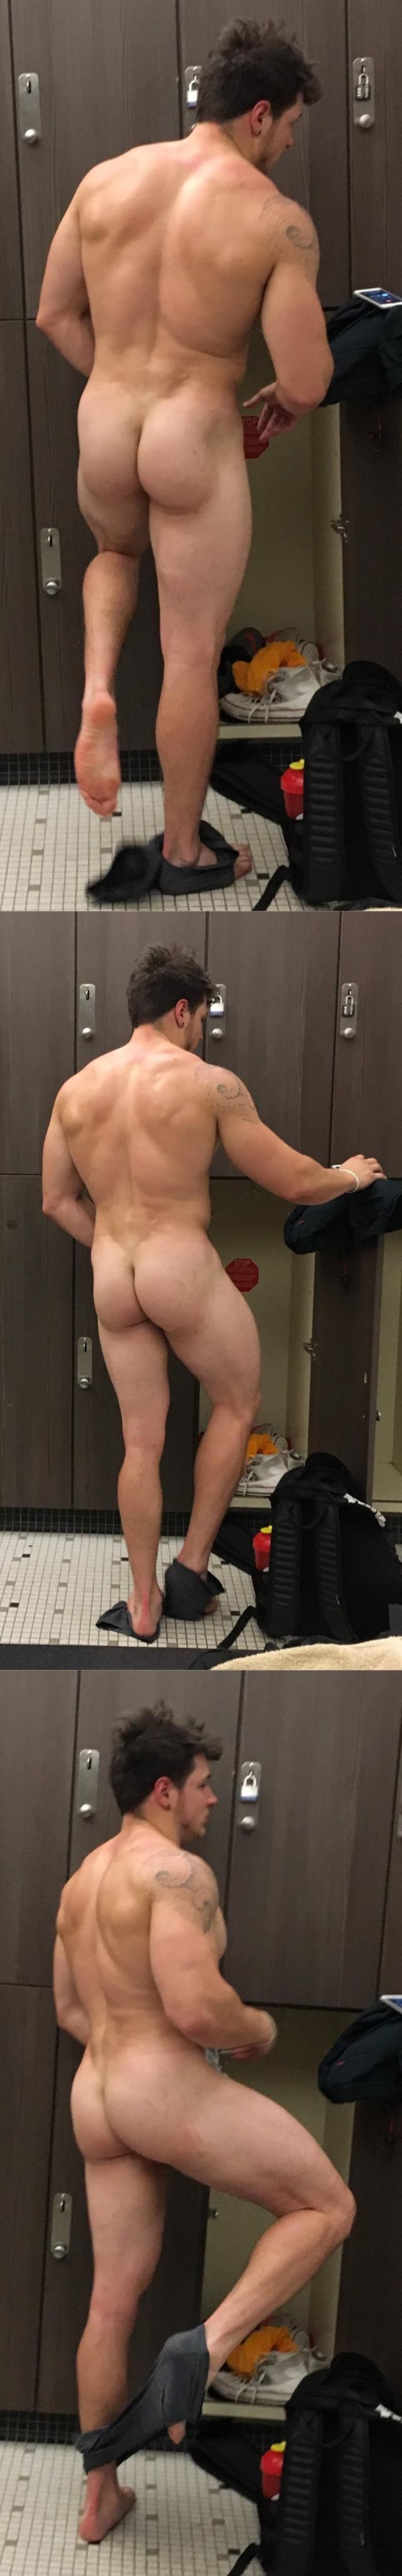 gym lockerroom stud naked ass